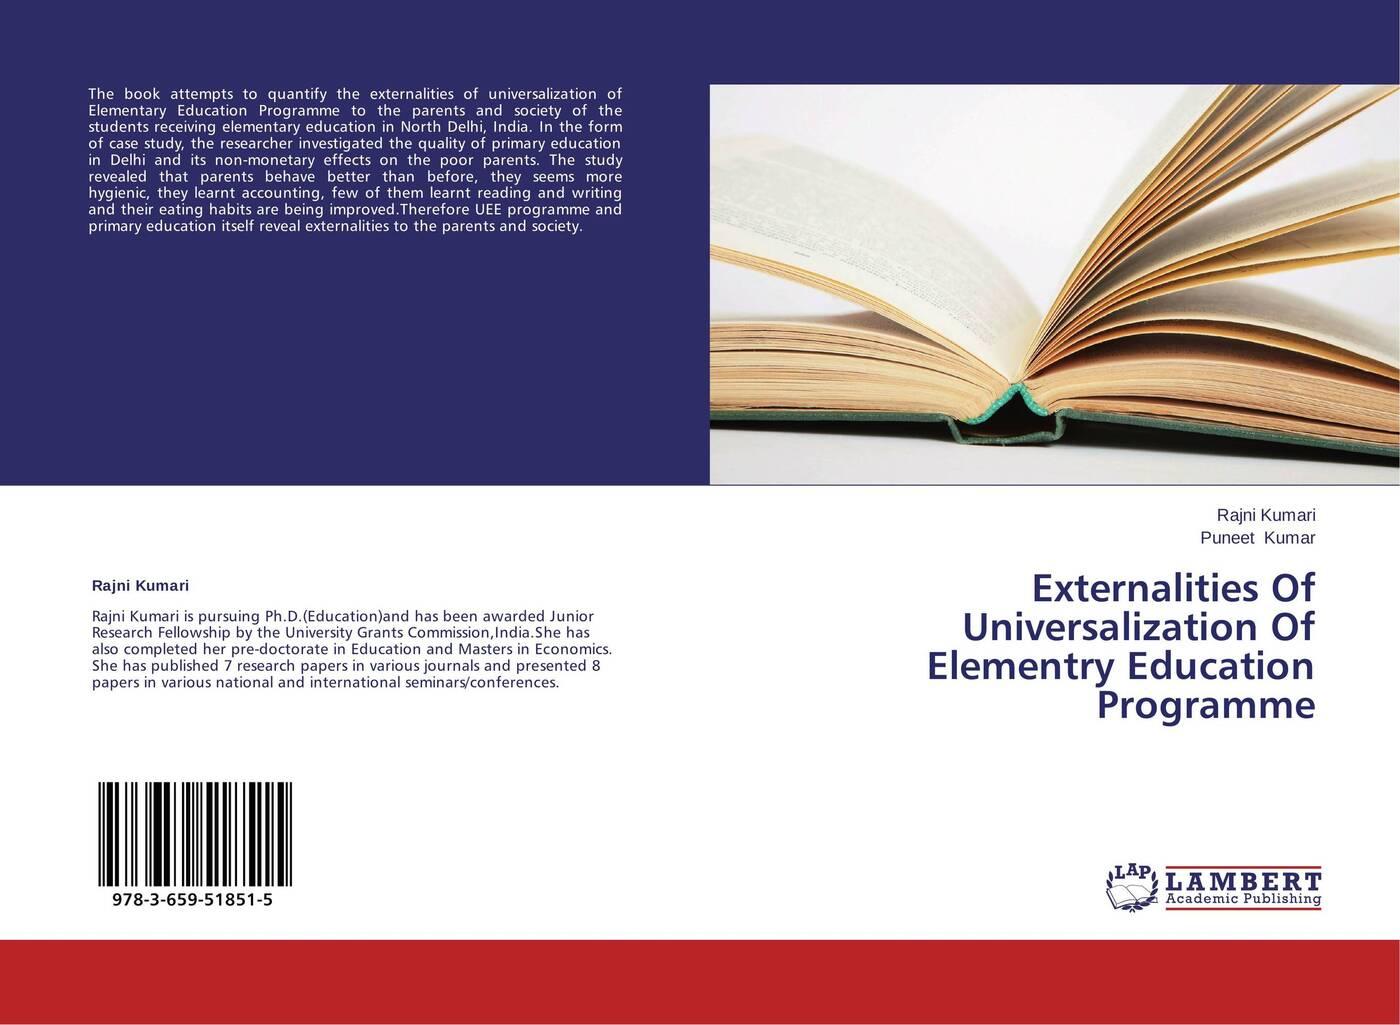 Rajni Kumari and Puneet Kumar Externalities Of Universalization Of Elementry Education Programme muhammad altaf qureshi universalization of primary education in pakistan